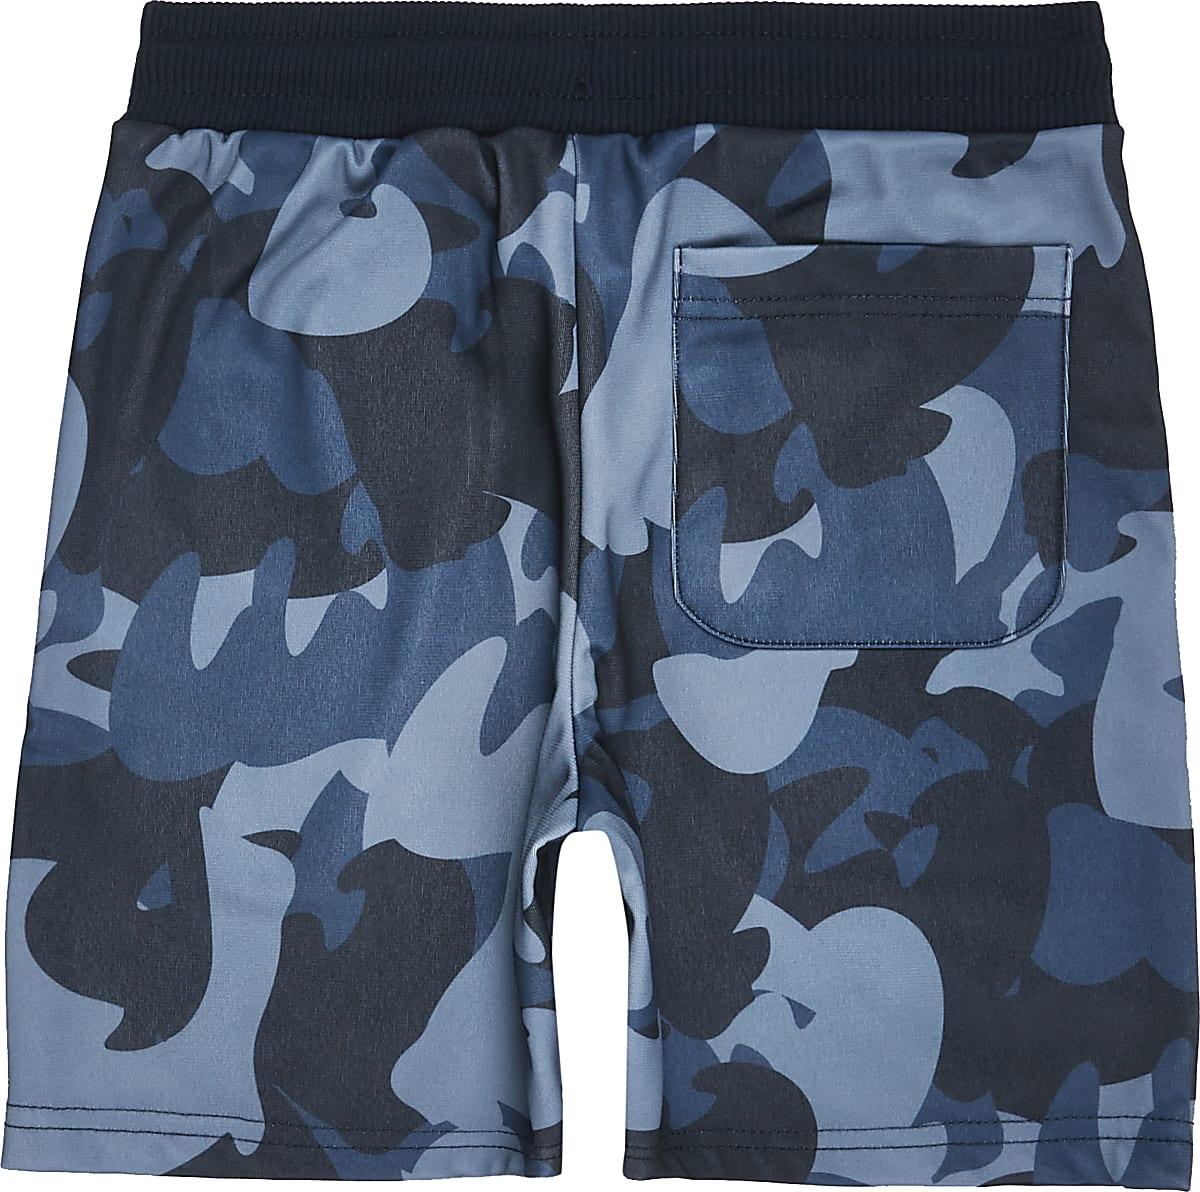 d5b1bdeeae Boys navy camo jersey shorts - Jersey Shorts - Shorts - boys